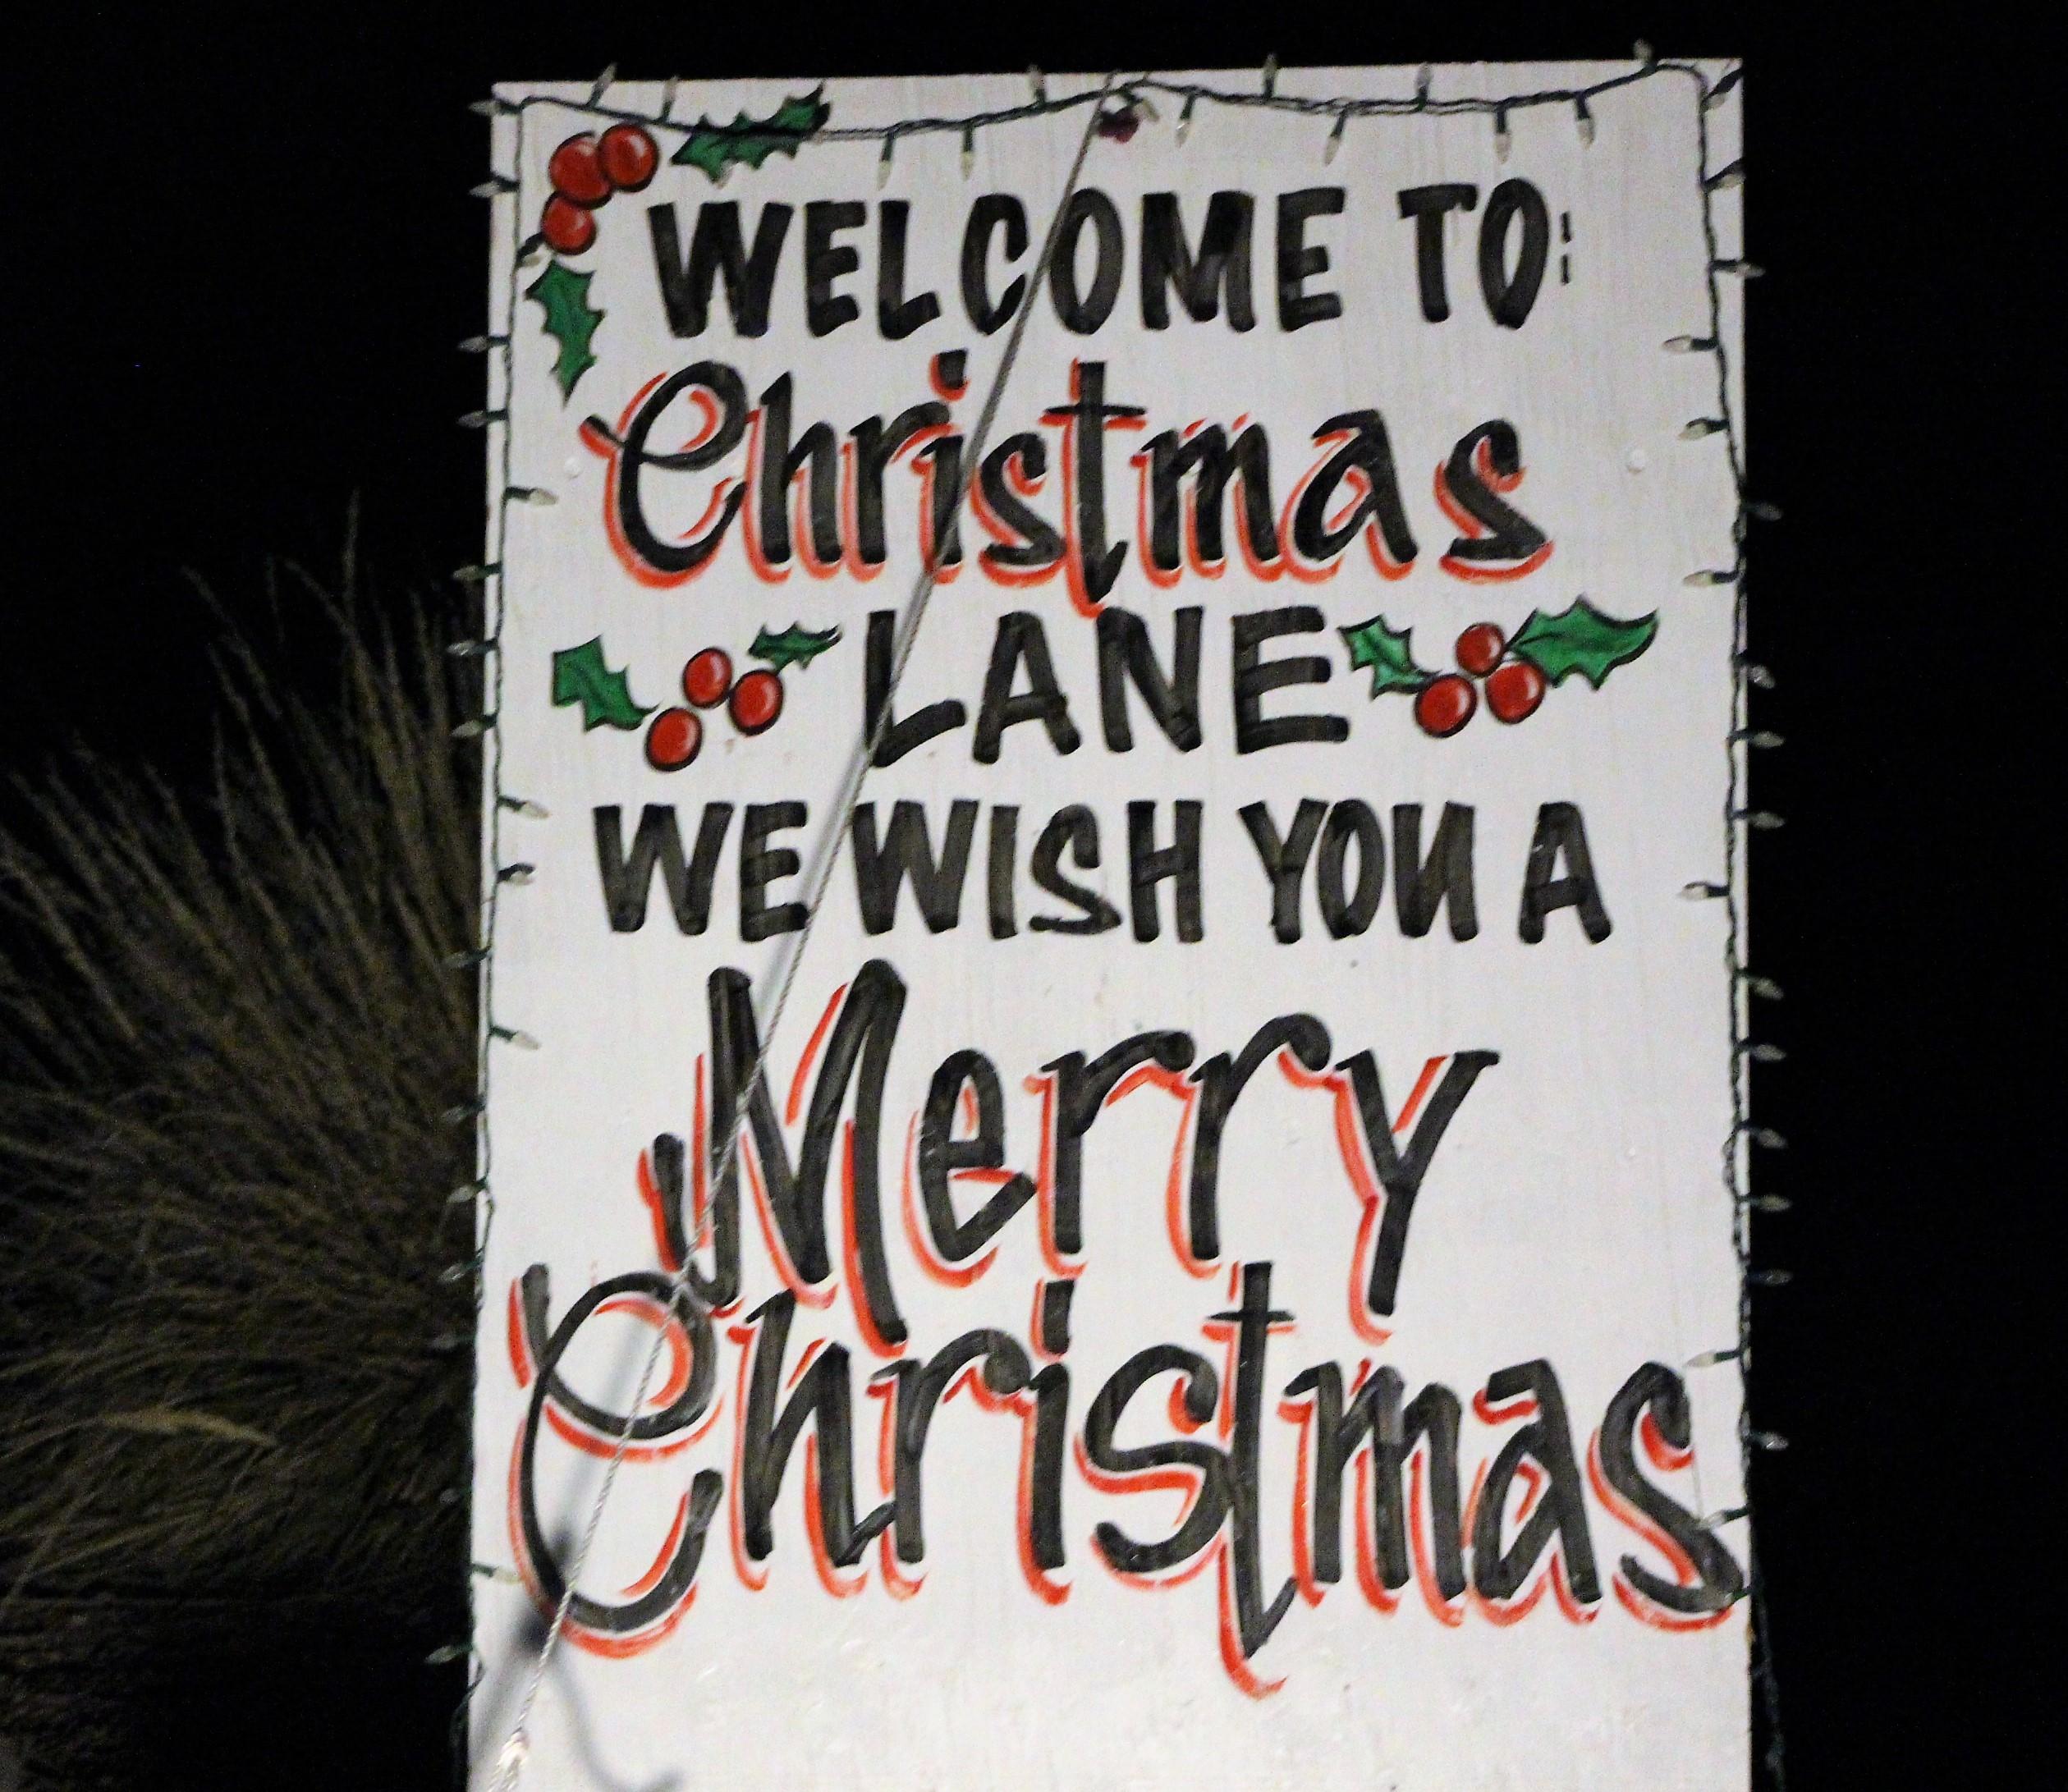 Christmas Lane turned on their lights Thanksgiving Weekend for the holidays. Cedar City, Utah, Nov. 26, 2016 | Photo by Tracie Sullivan, St. George / Cedar City News